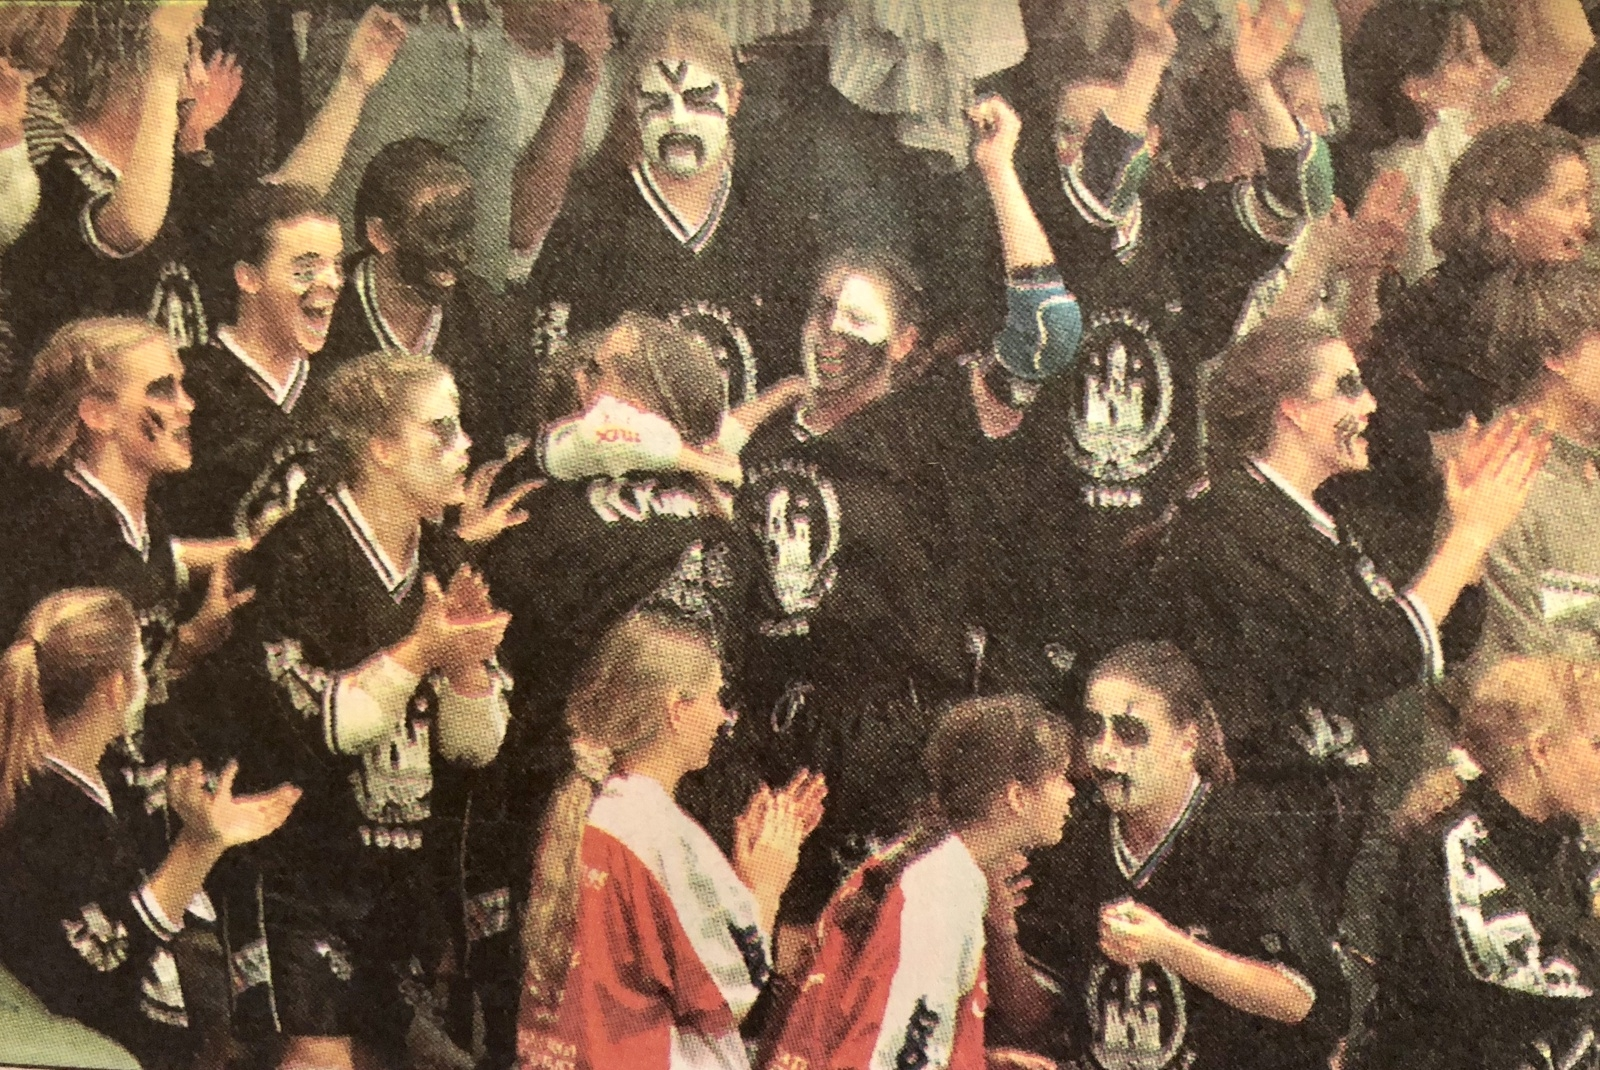 1995.